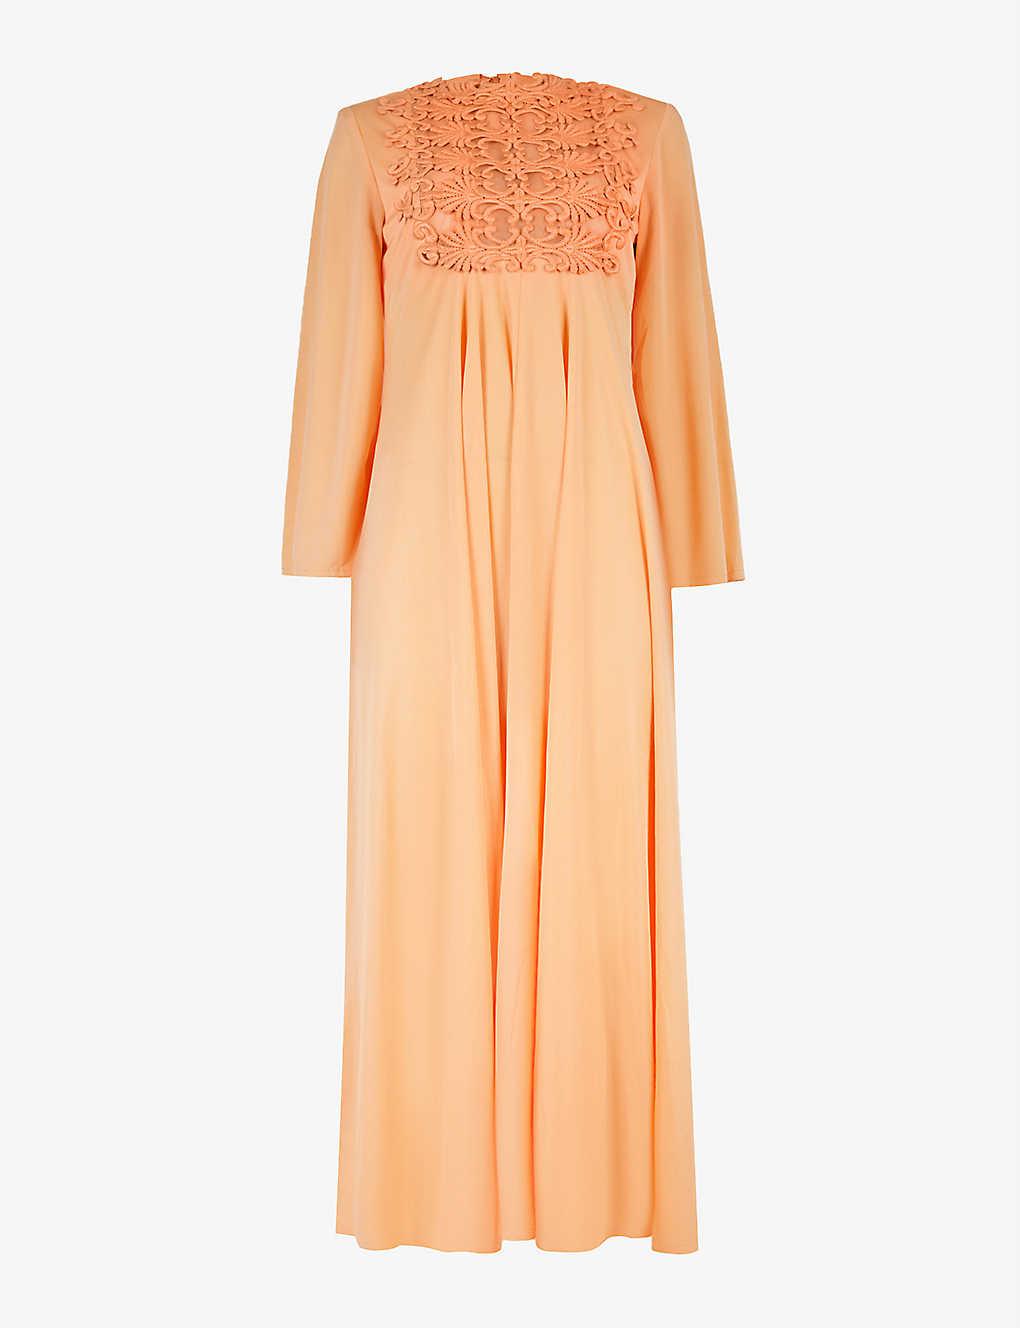 Pre-loved 1970s brocade woven midi dress